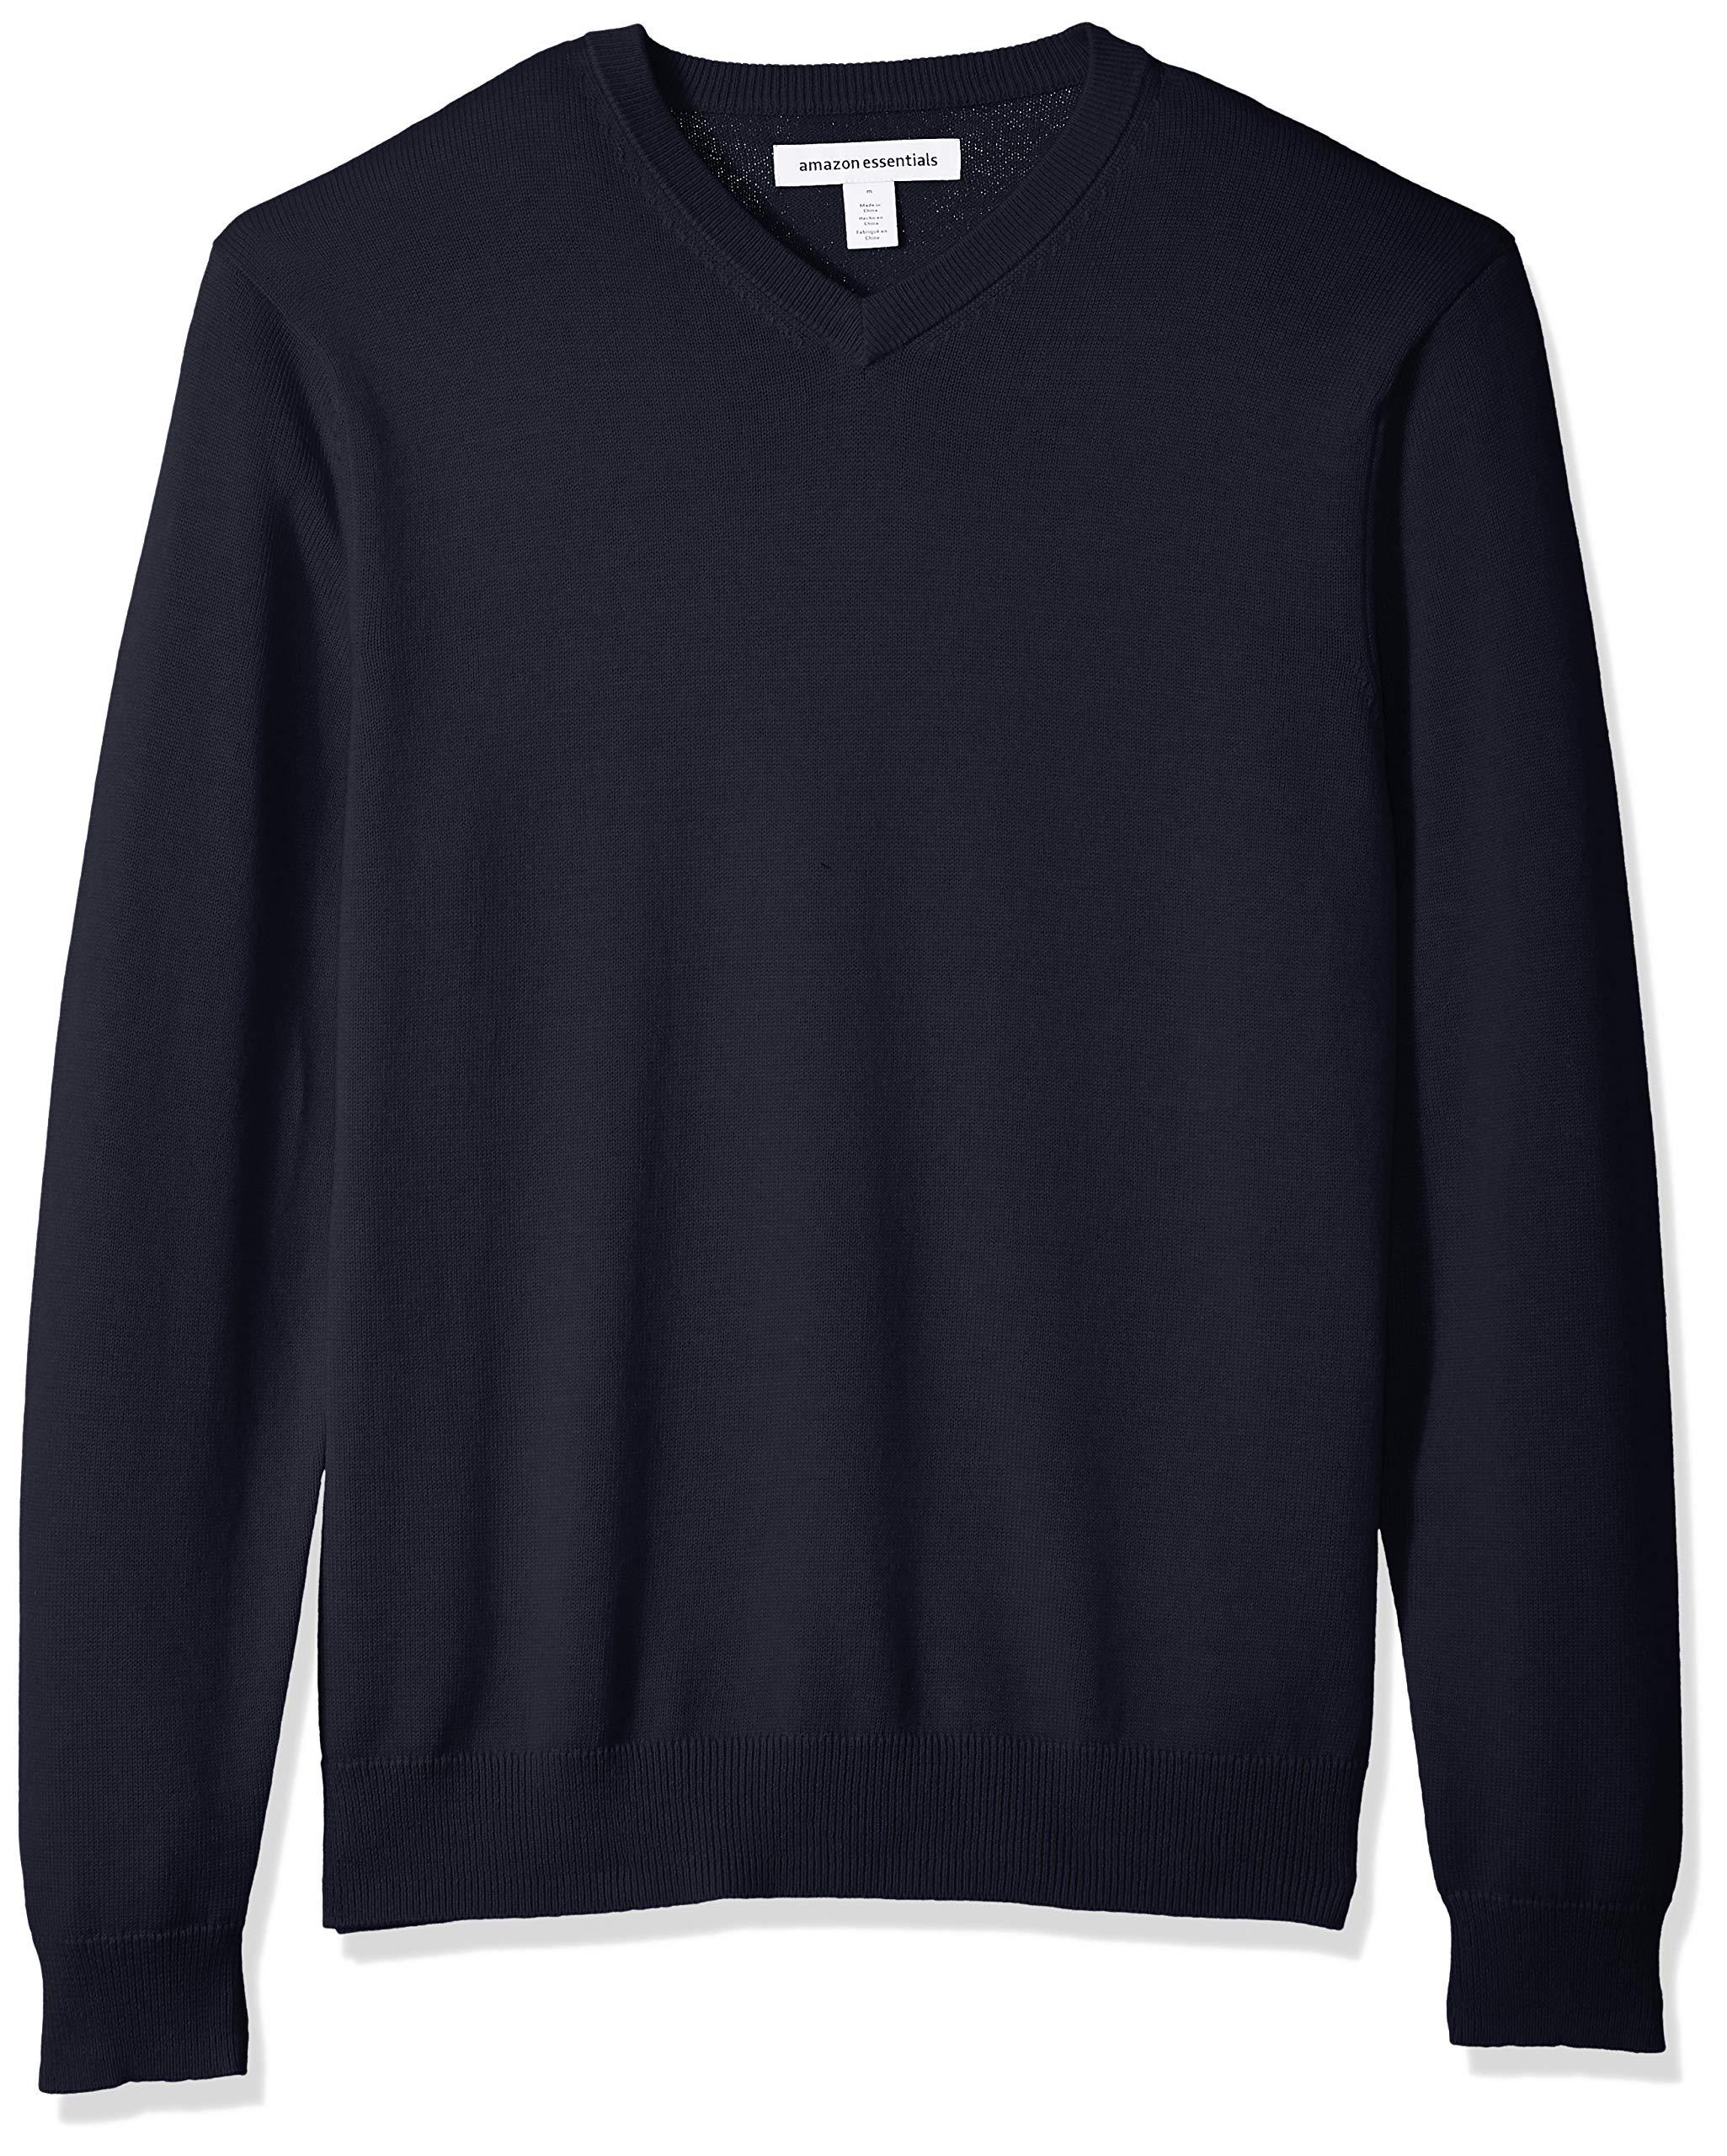 Amazon Essentials Men's V-Neck Sweater, Navy, Large